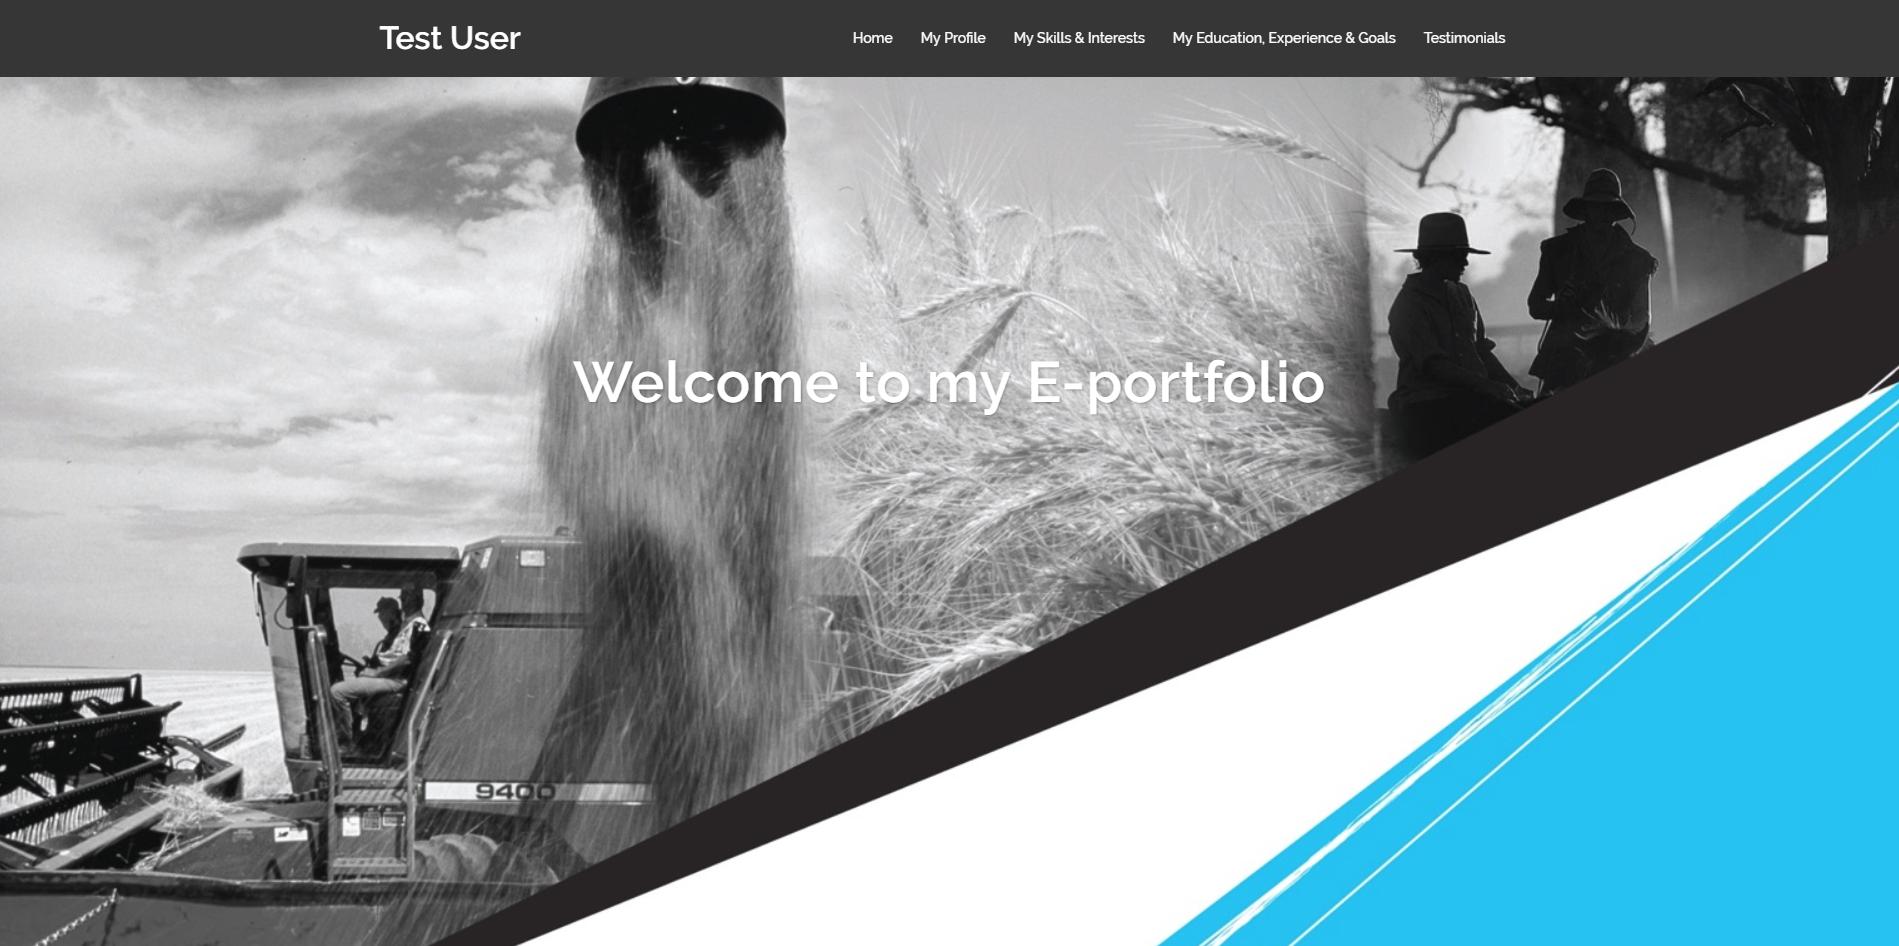 See example e-portfolio